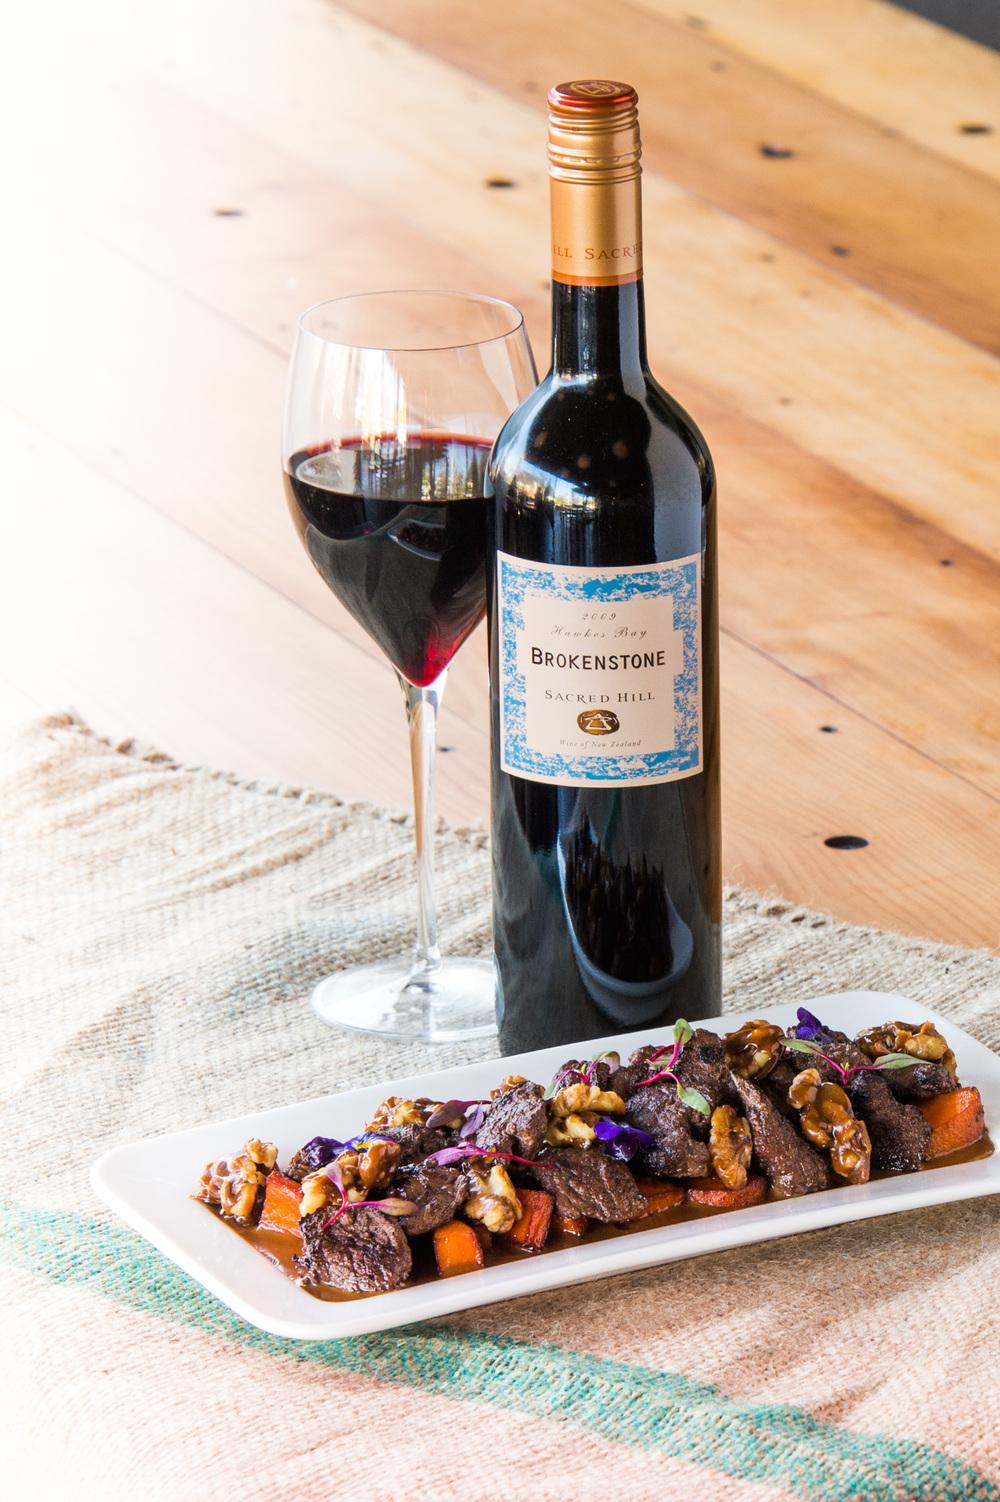 Wine and Food shoot, Hawkes Bay.